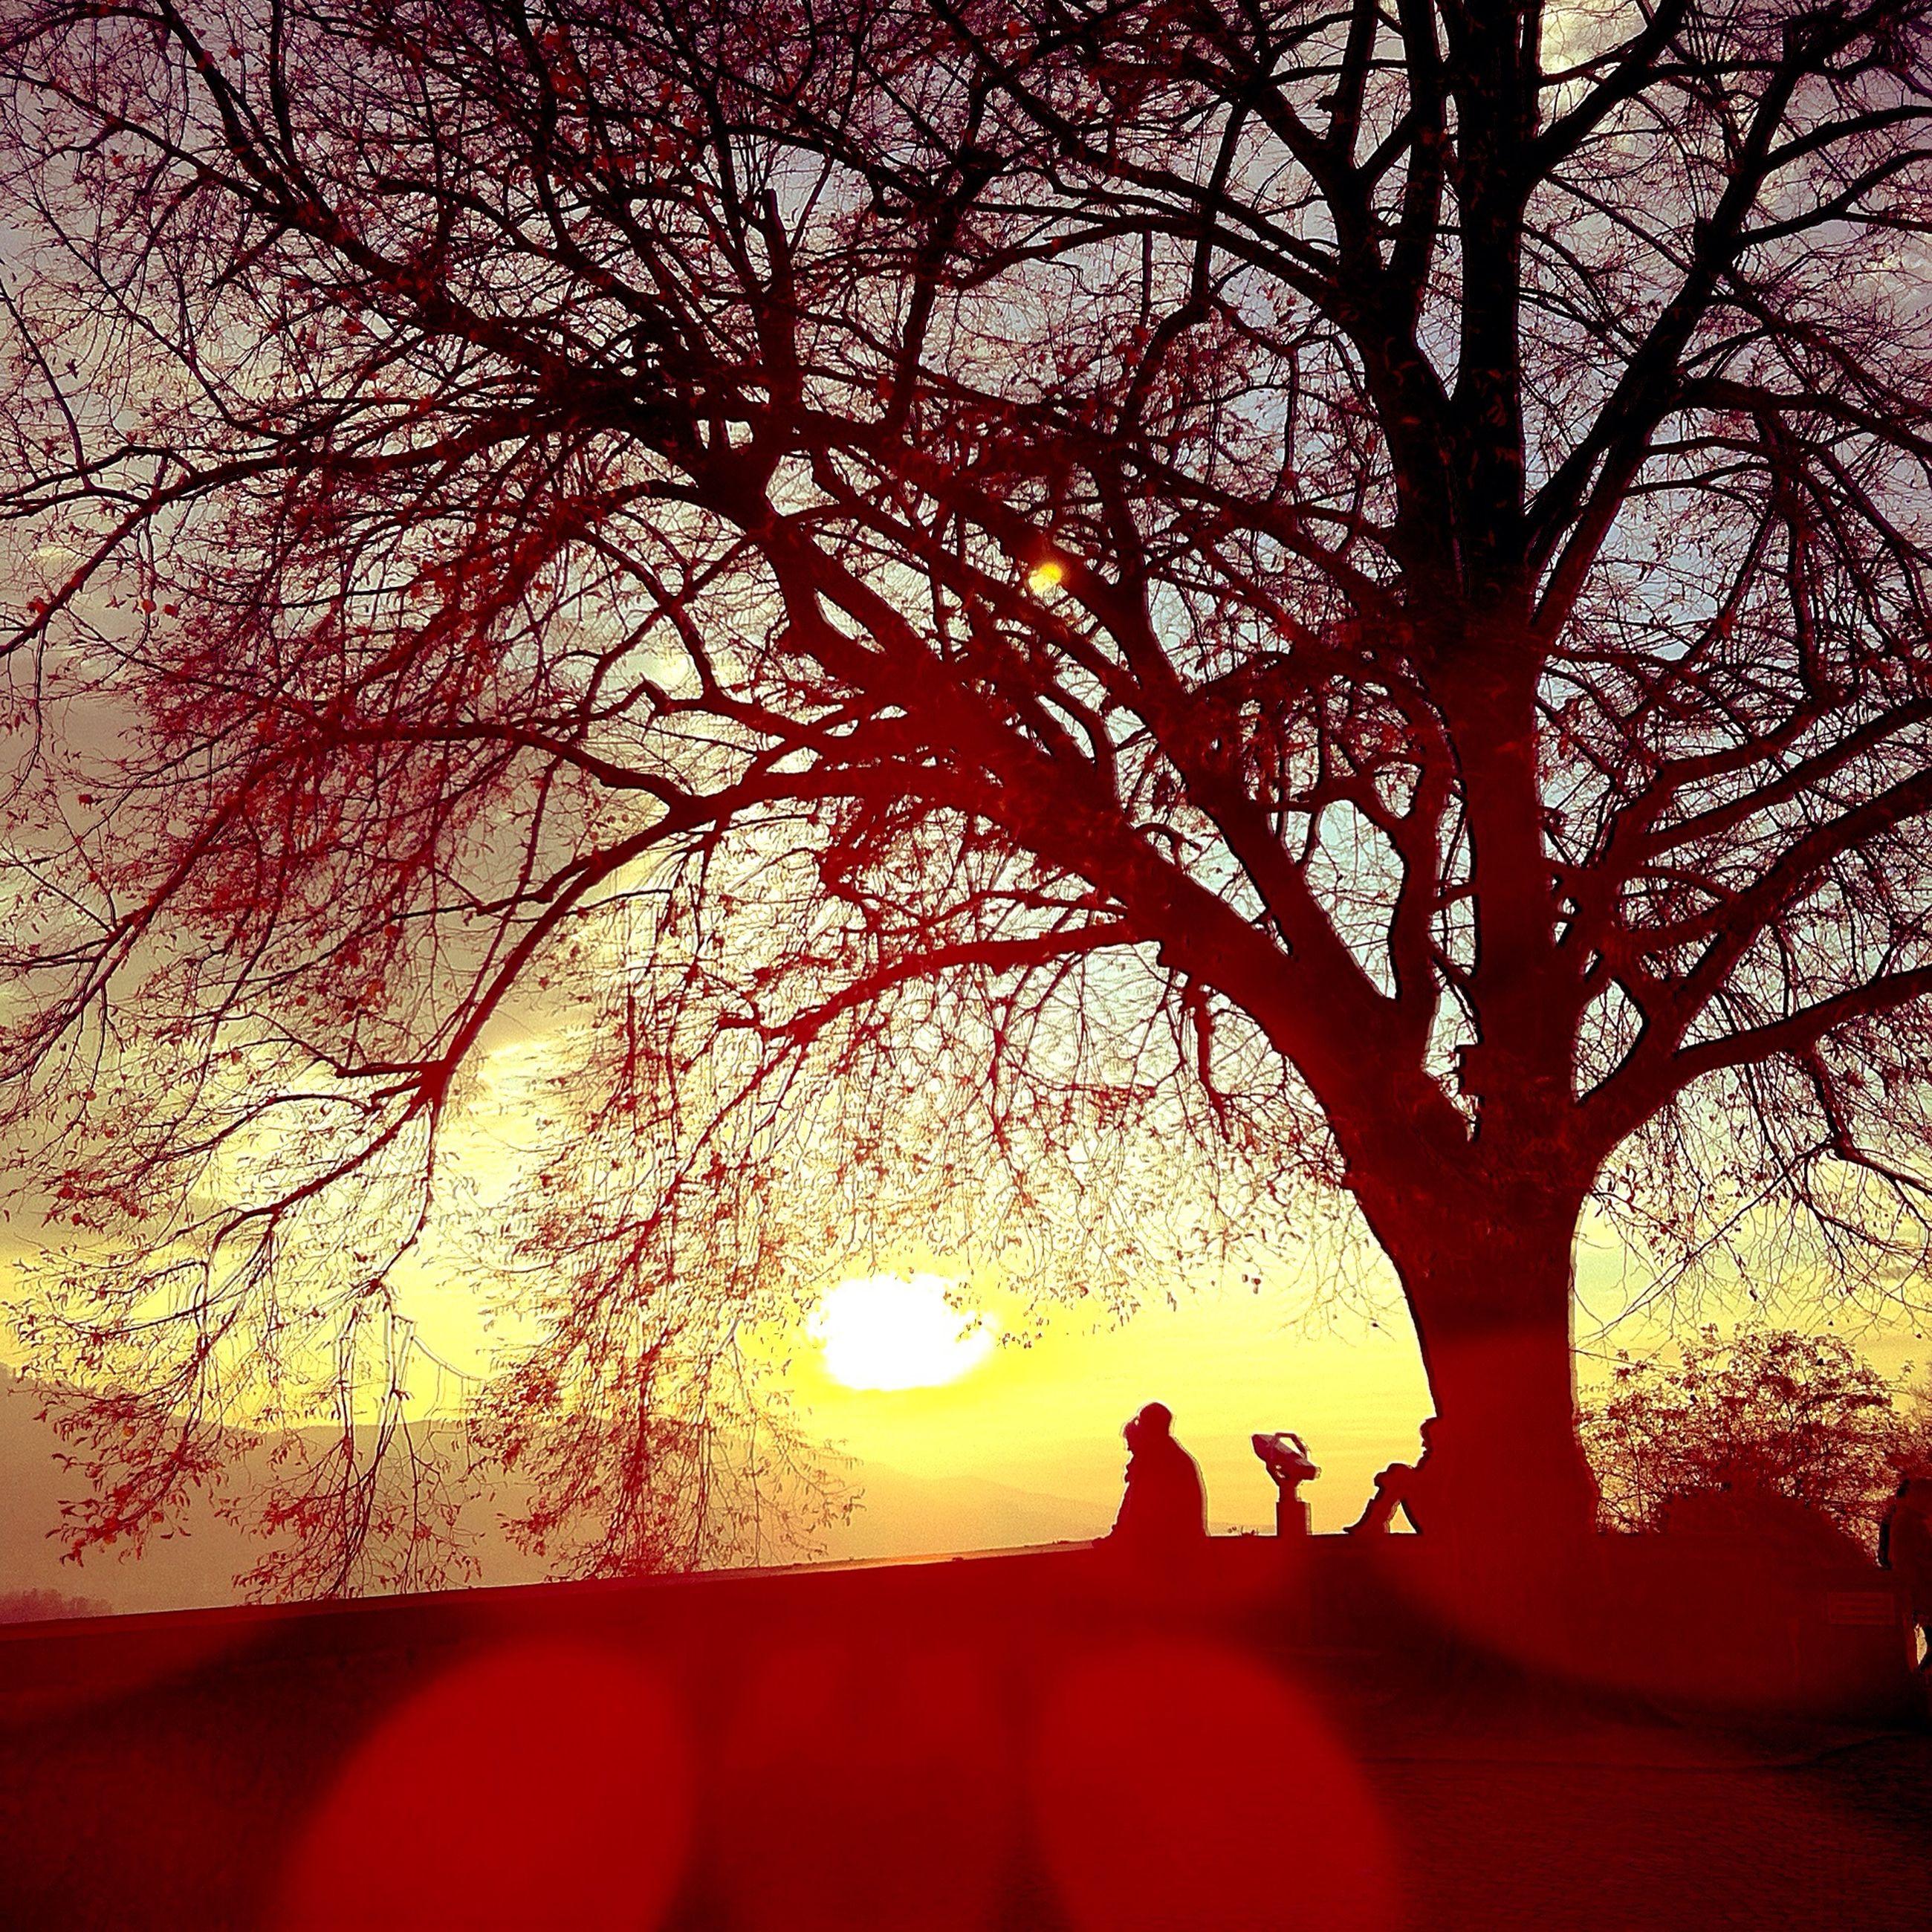 sunset, silhouette, tree, sun, branch, orange color, tranquility, tranquil scene, bare tree, beauty in nature, scenics, sunlight, nature, sky, idyllic, lens flare, sunbeam, landscape, back lit, outline